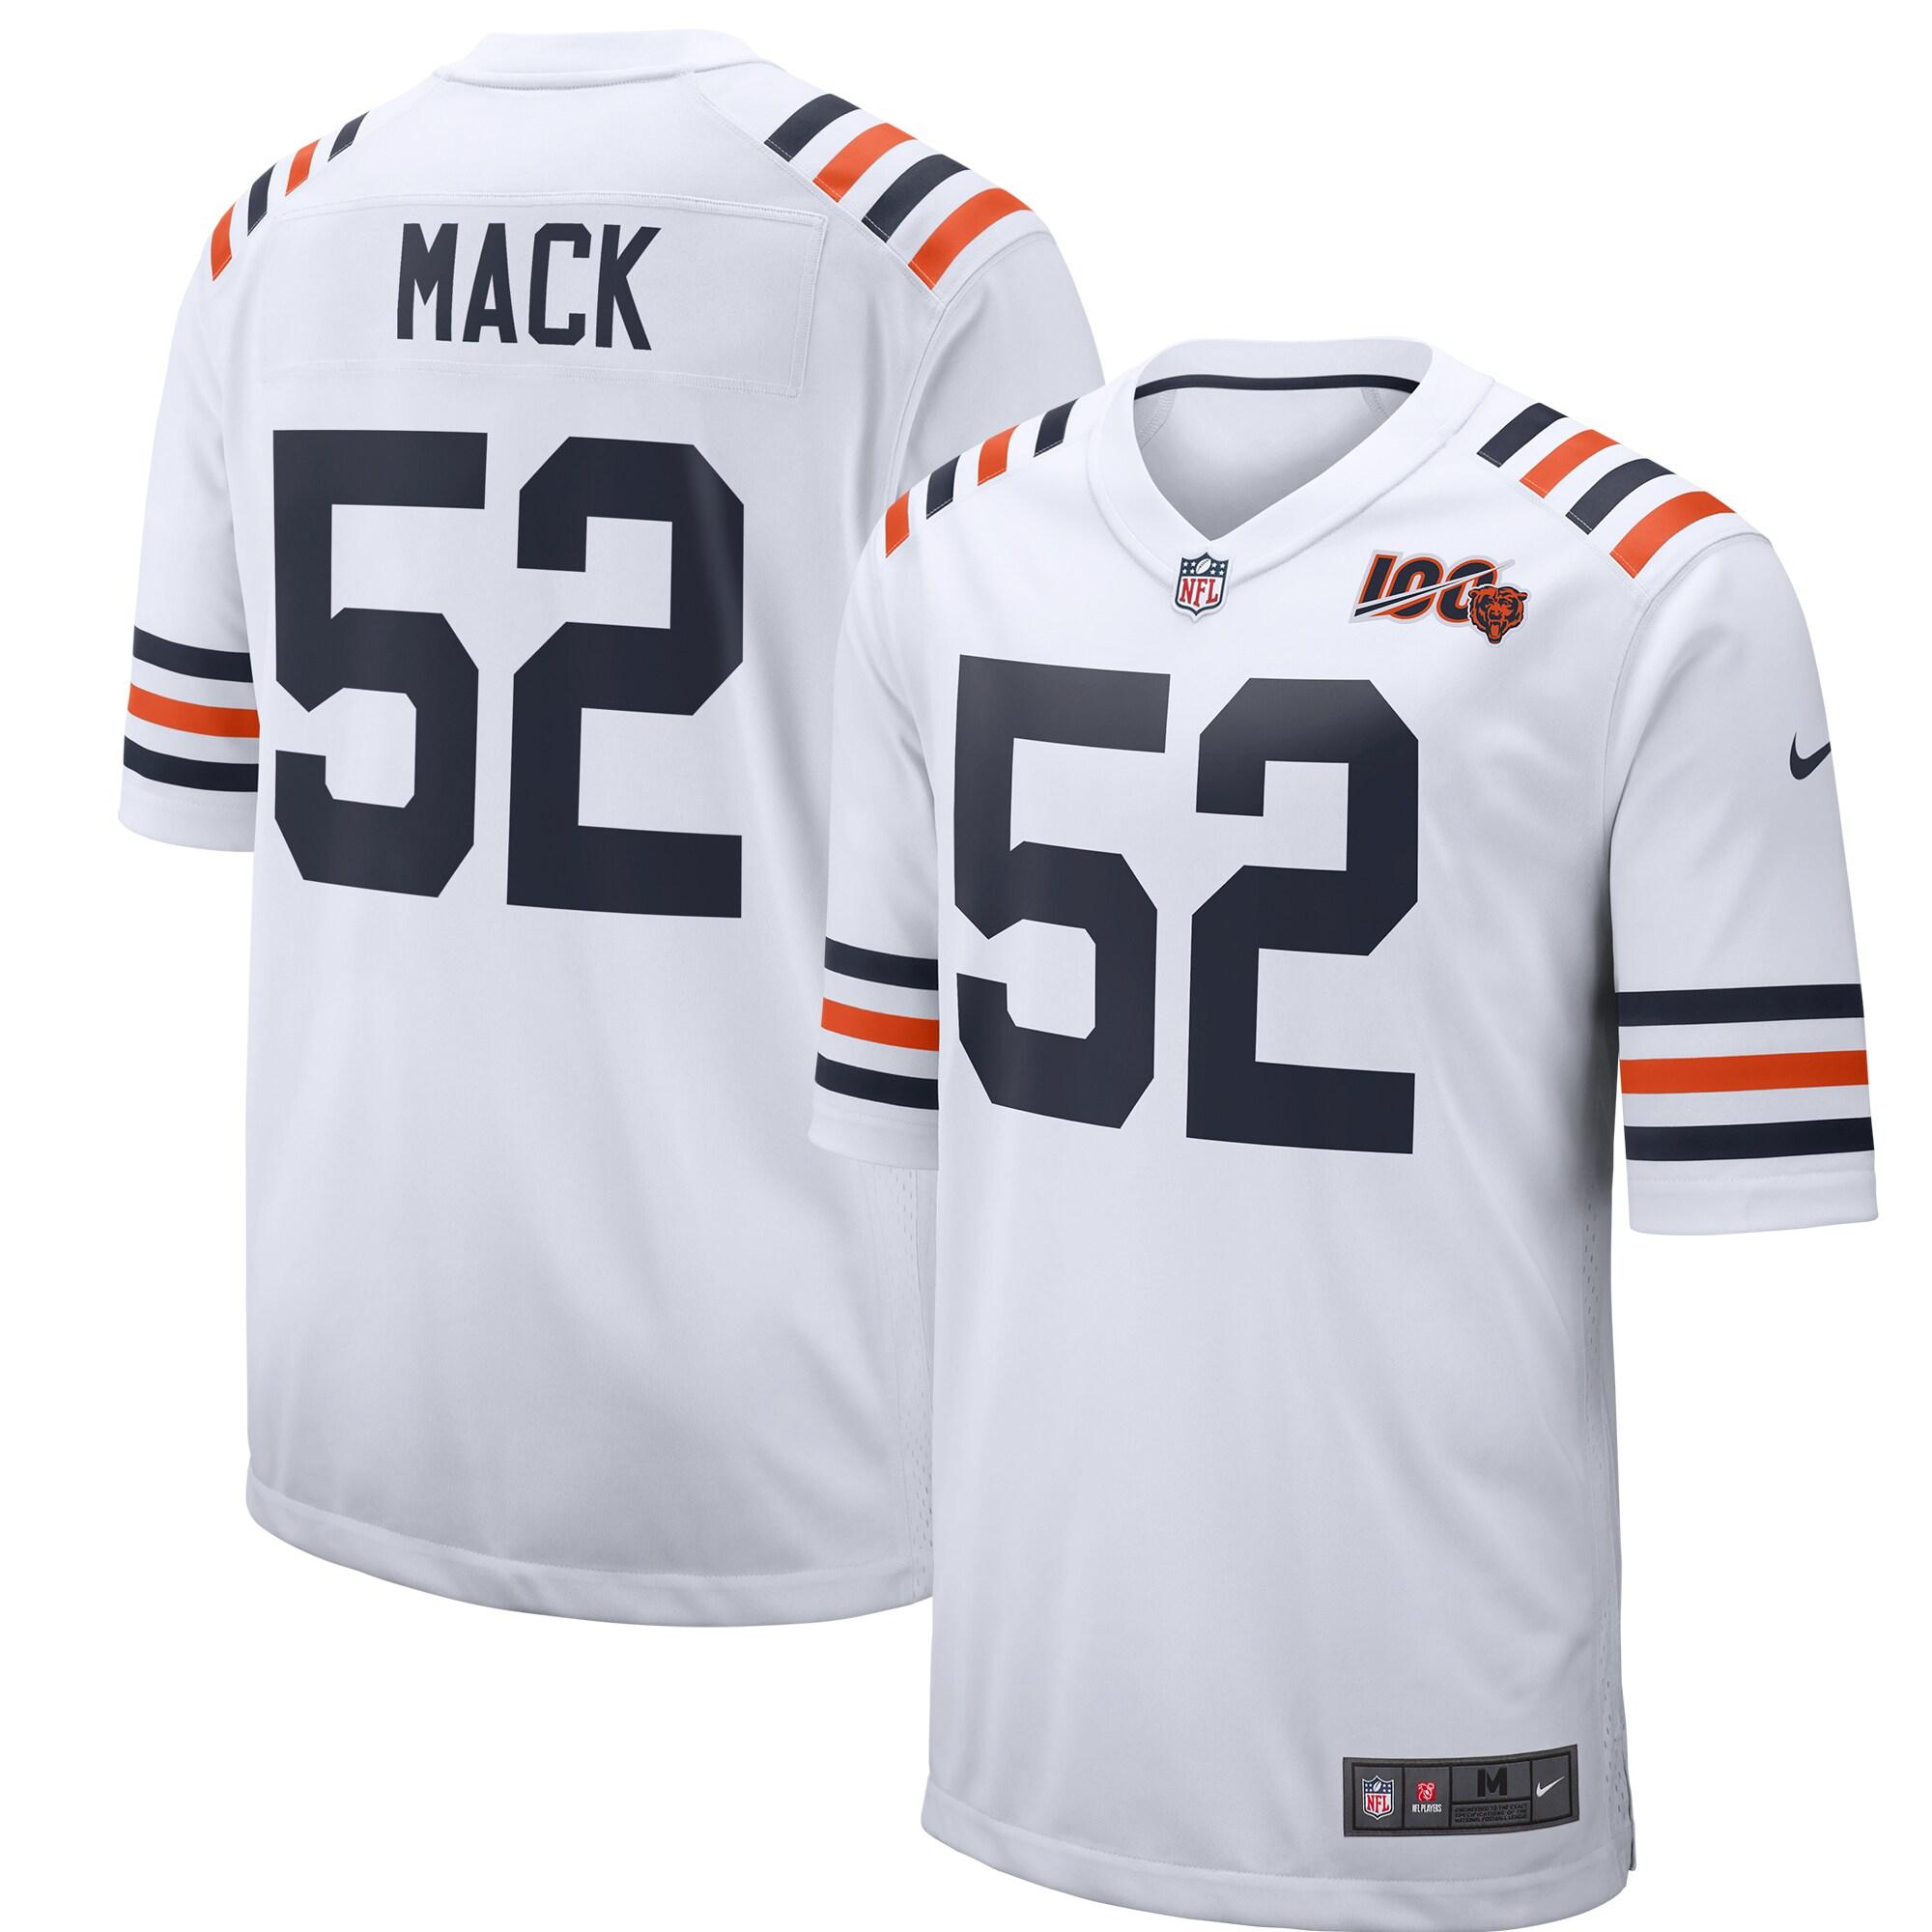 Khalil Mack Chicago Bears Nike 2019 100th Season Alternate Classic Player Game Jersey - White